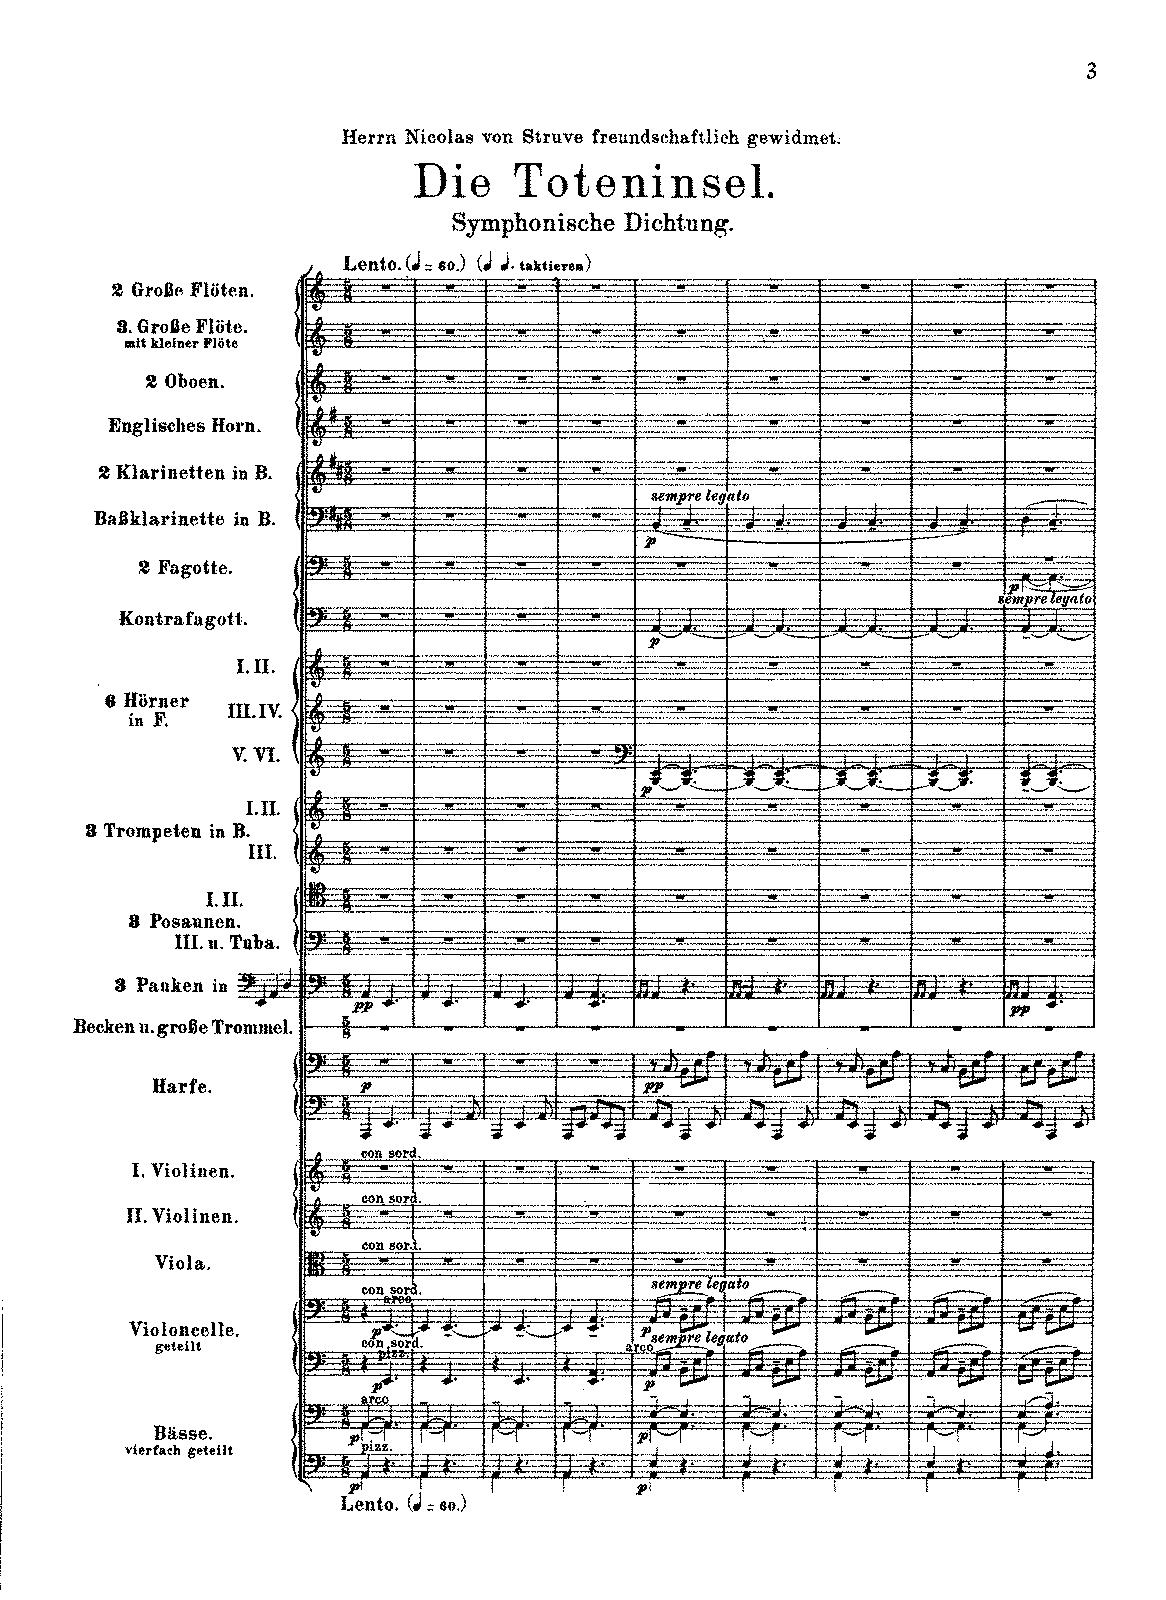 Rachmaninov, op. 29